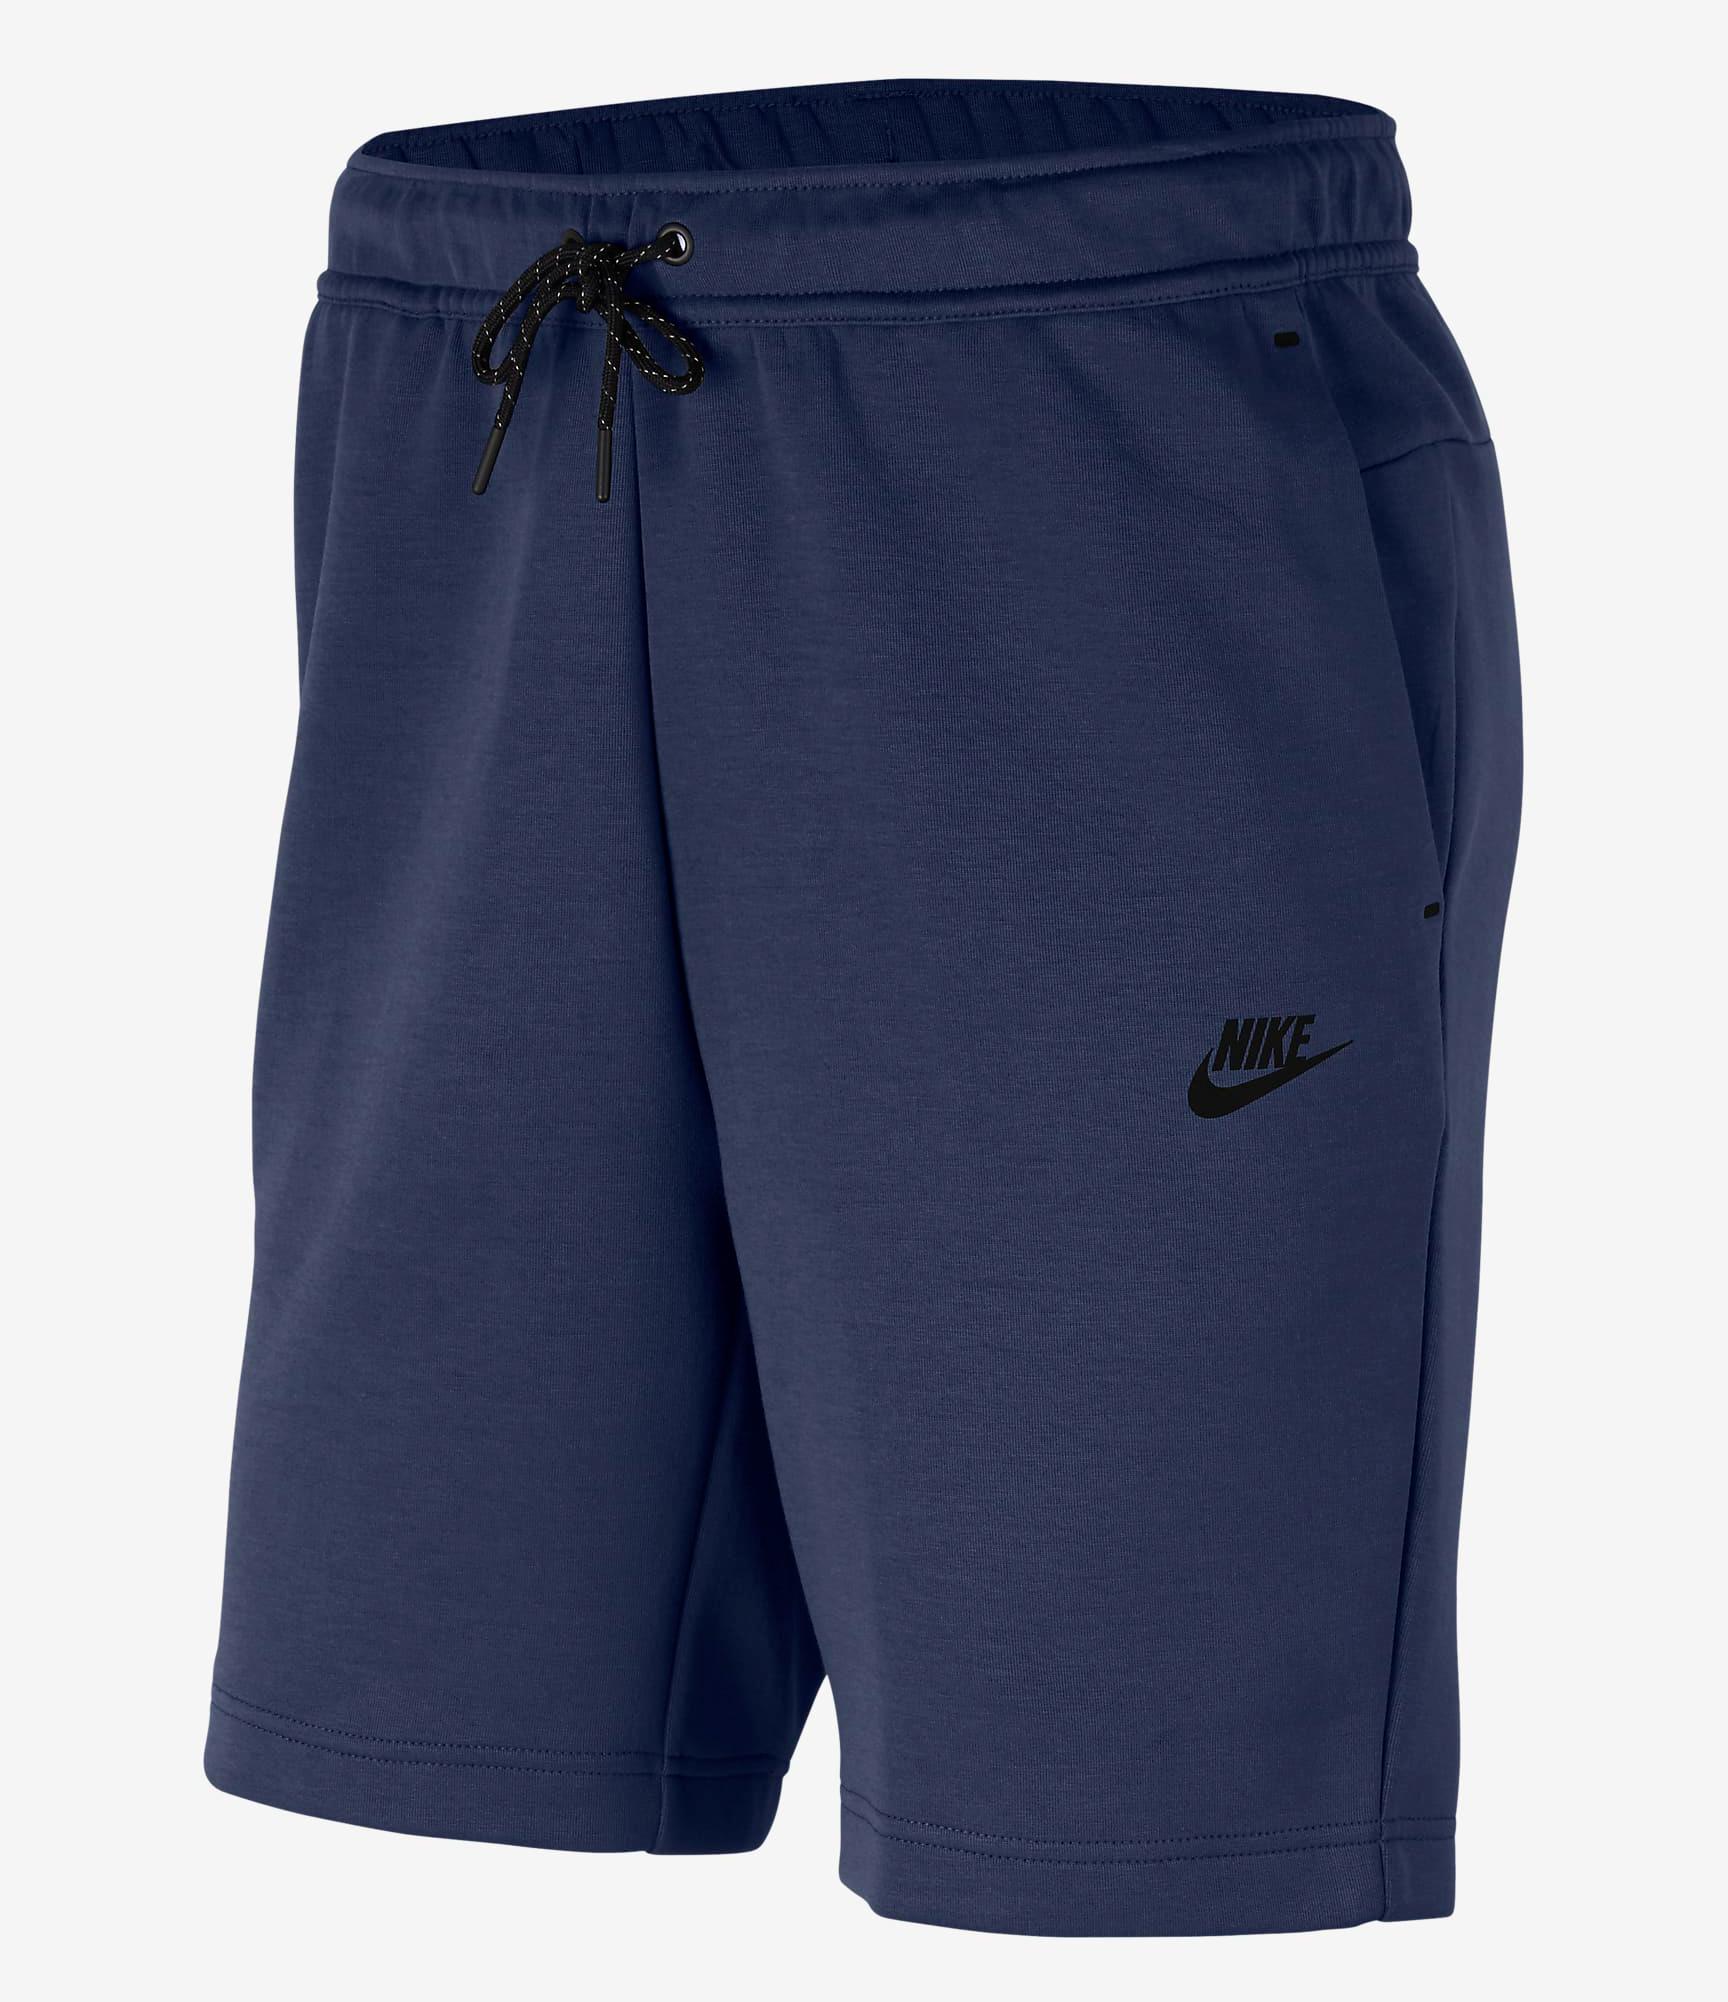 nike-midnight-navy-tech-fleece-shorts